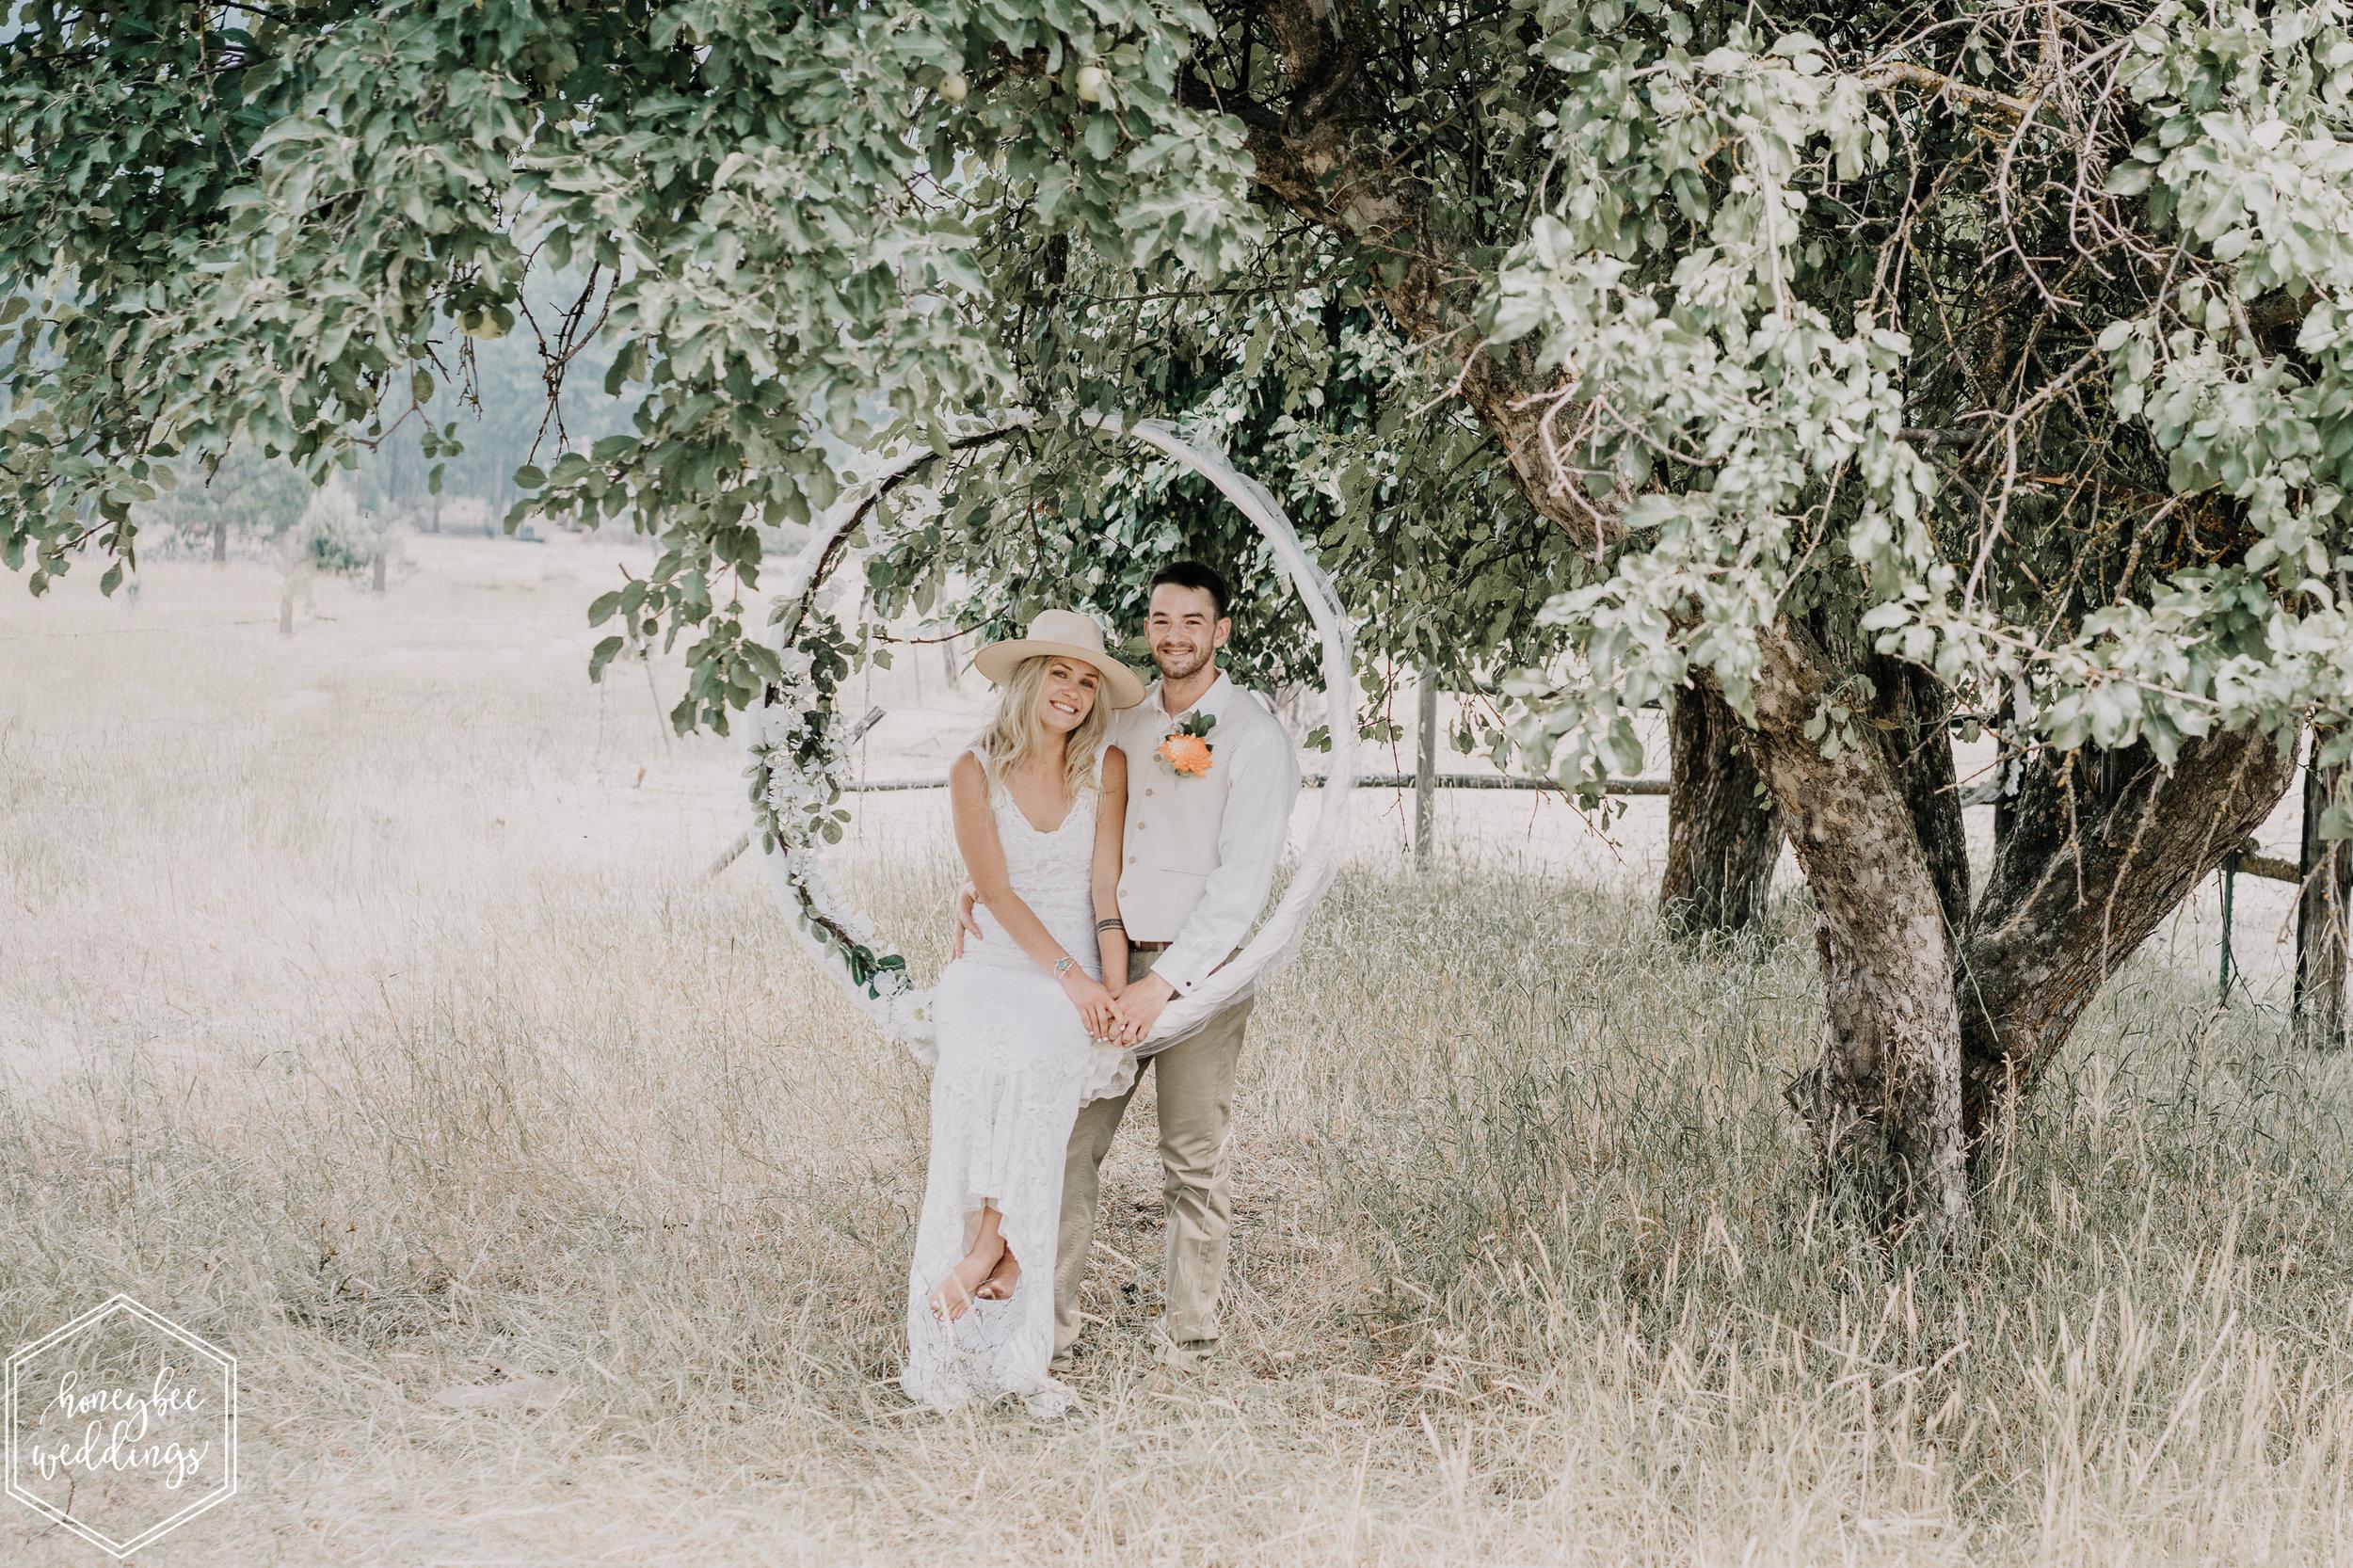 0150Alberton Wedding_Montana Wedding Photographer_Anneliesa Bashaw + Wyatt Zeylawy_August 11, 2018-329.jpg